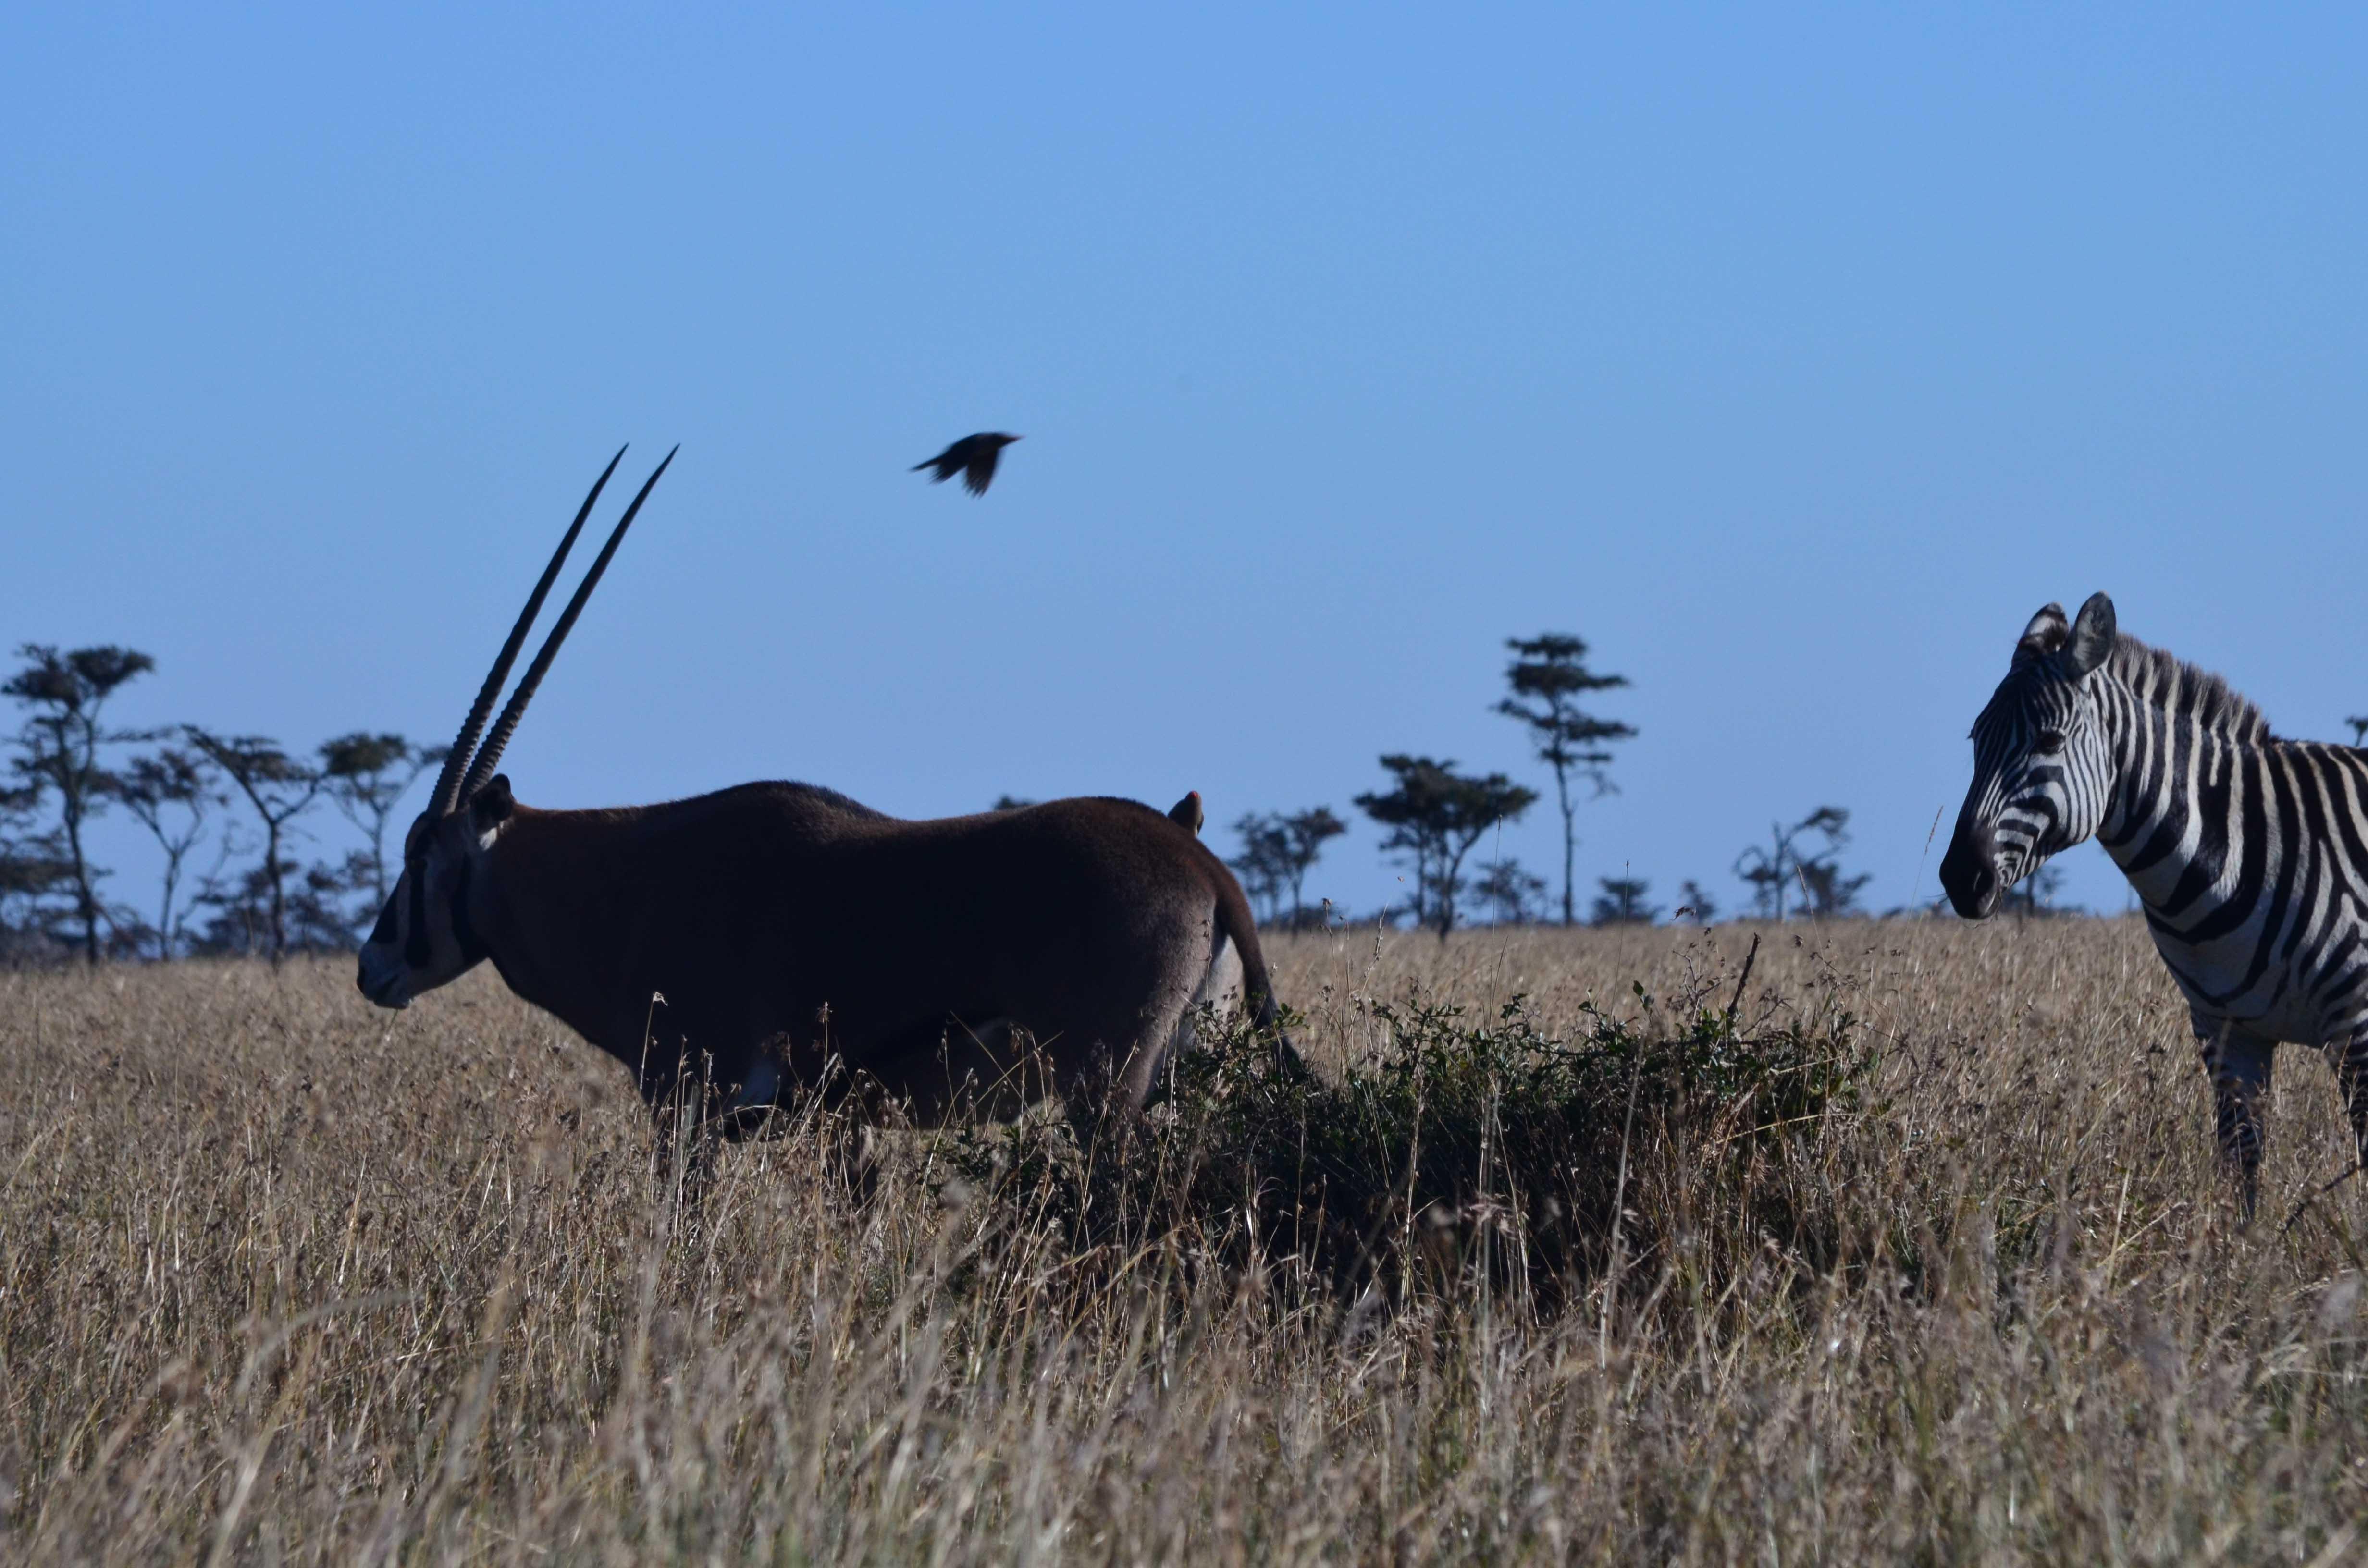 orix en Ol pejeta Kenya safaris